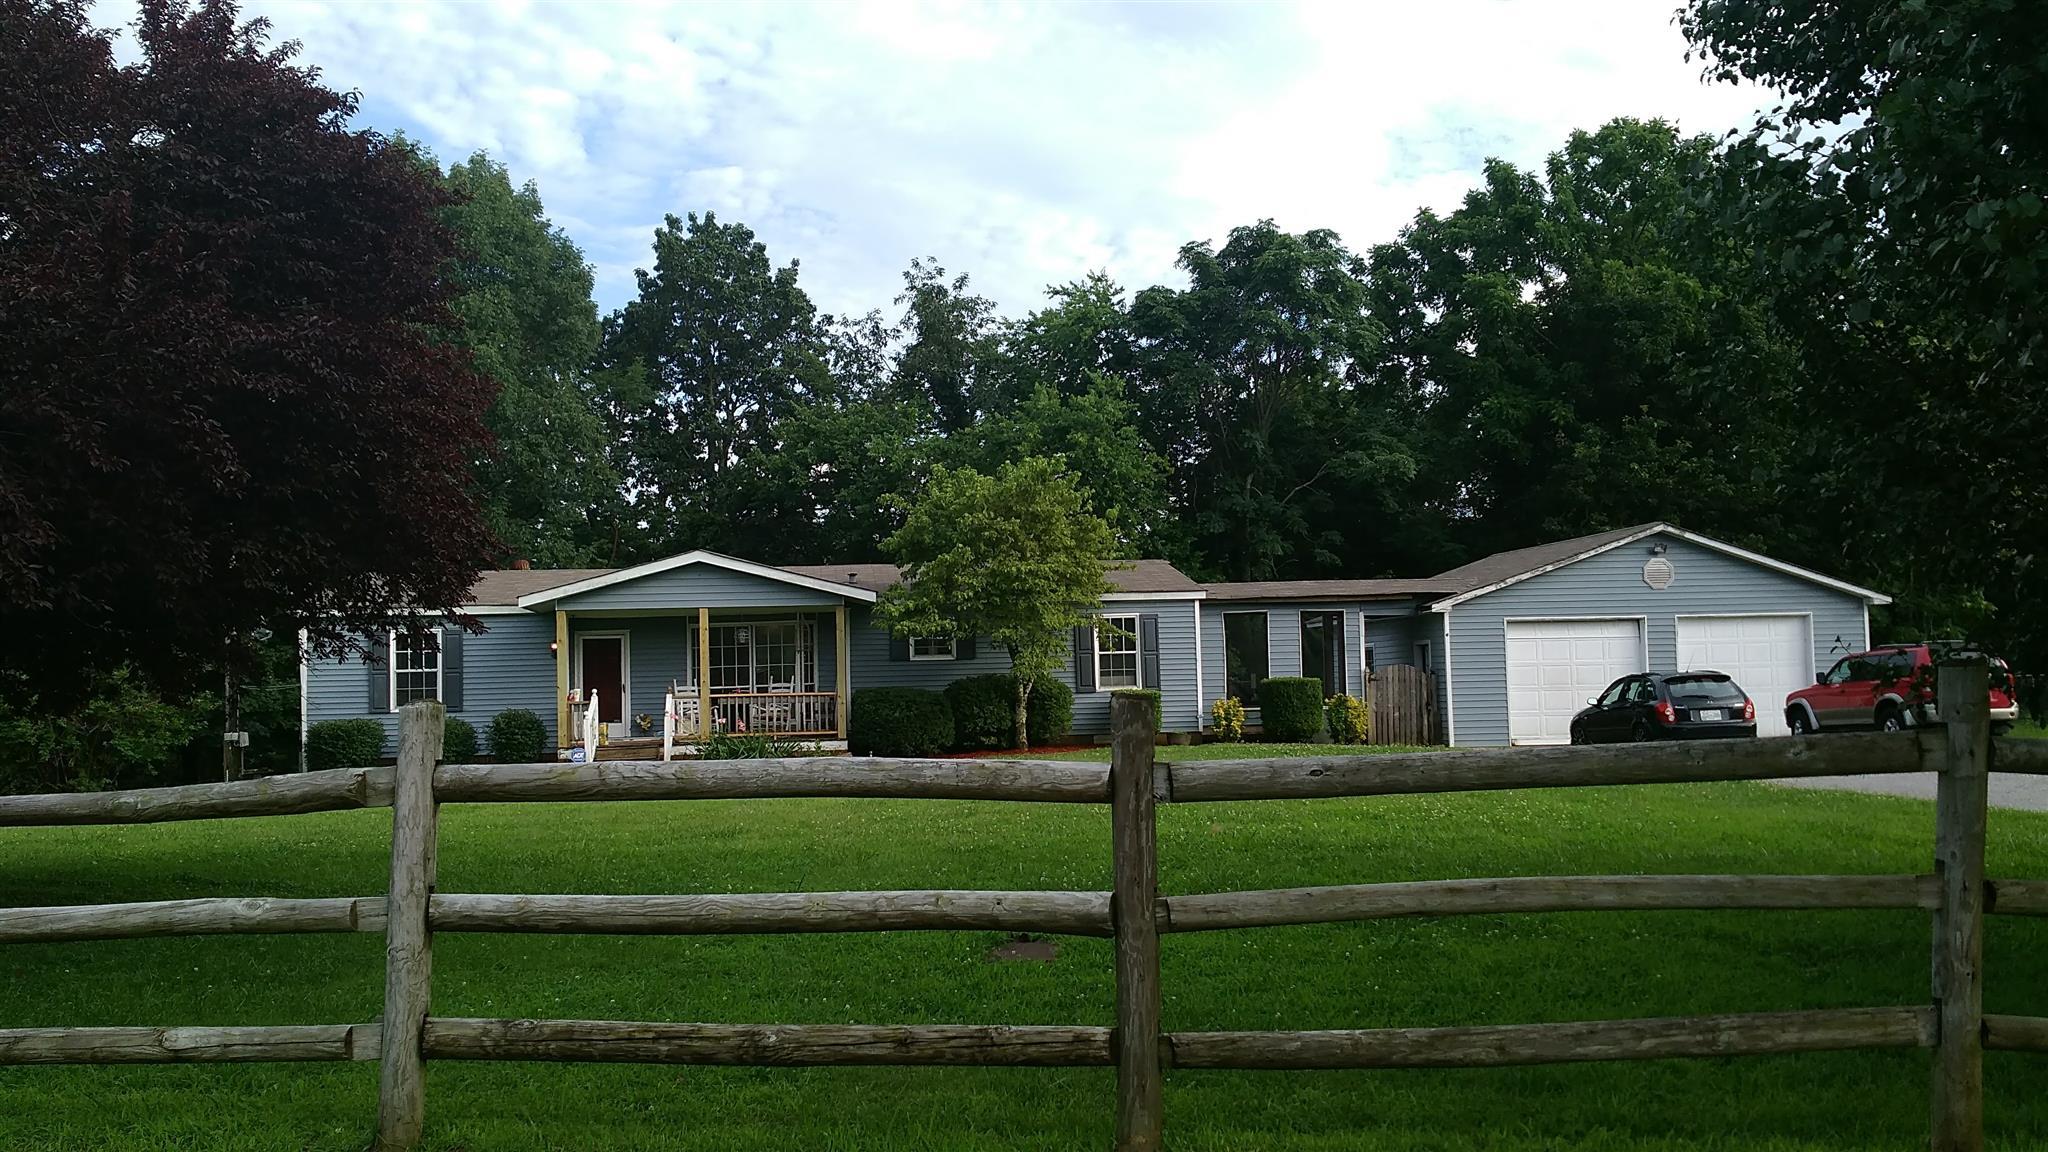 Photo of 2800 Greer  Goodlettsville  TN